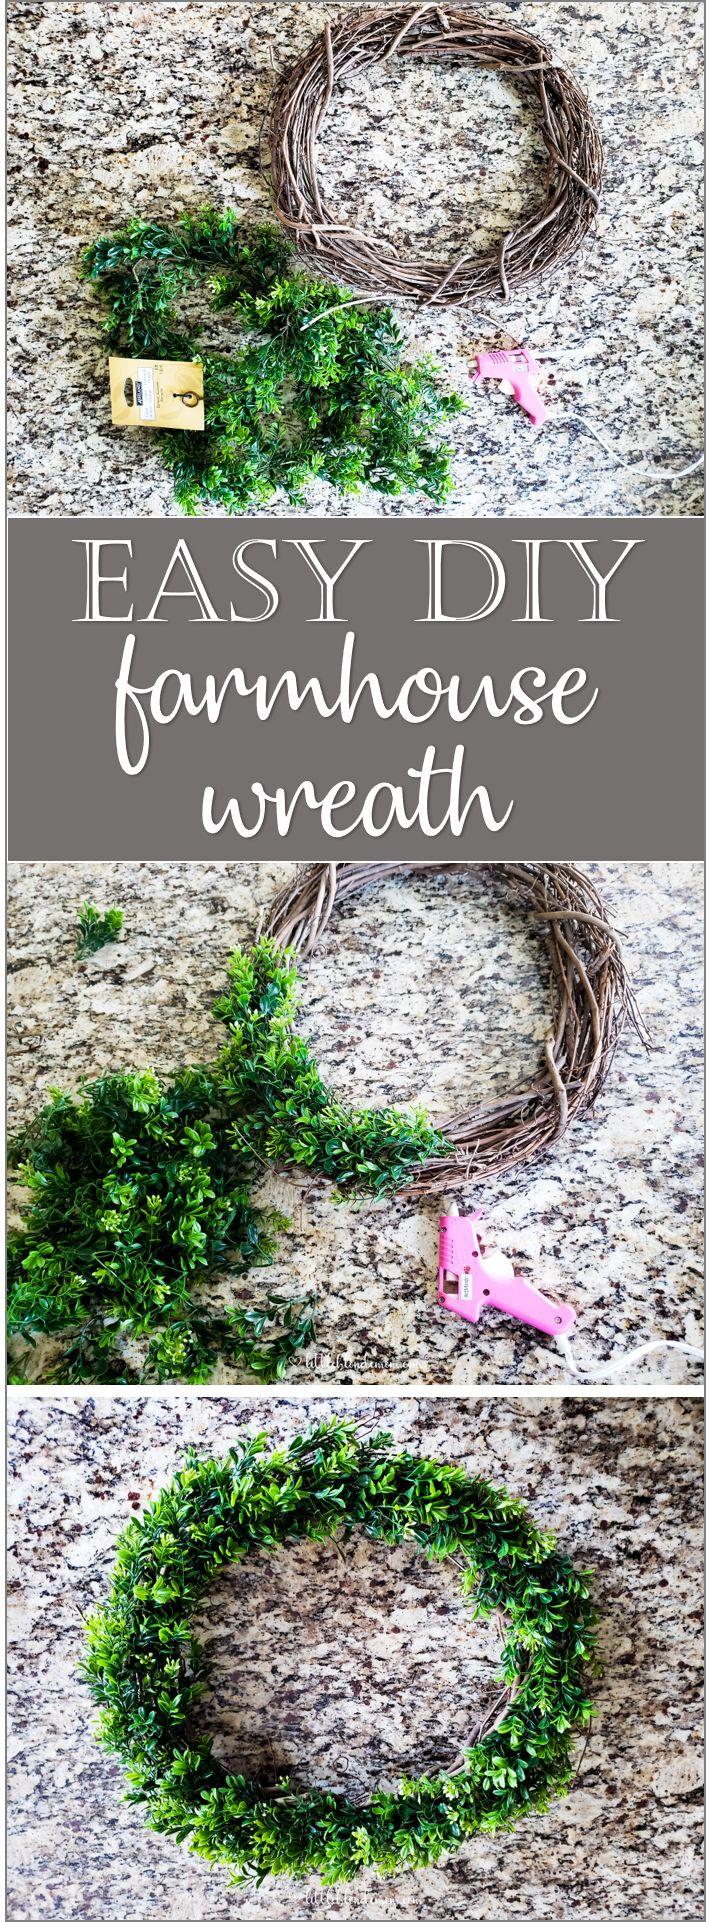 Super easy farmhouse sign & DIY wreath! Free printable – Little Blonde Mom Blog #farmhousedecor #modernfarmhouse #freeprintable #printable